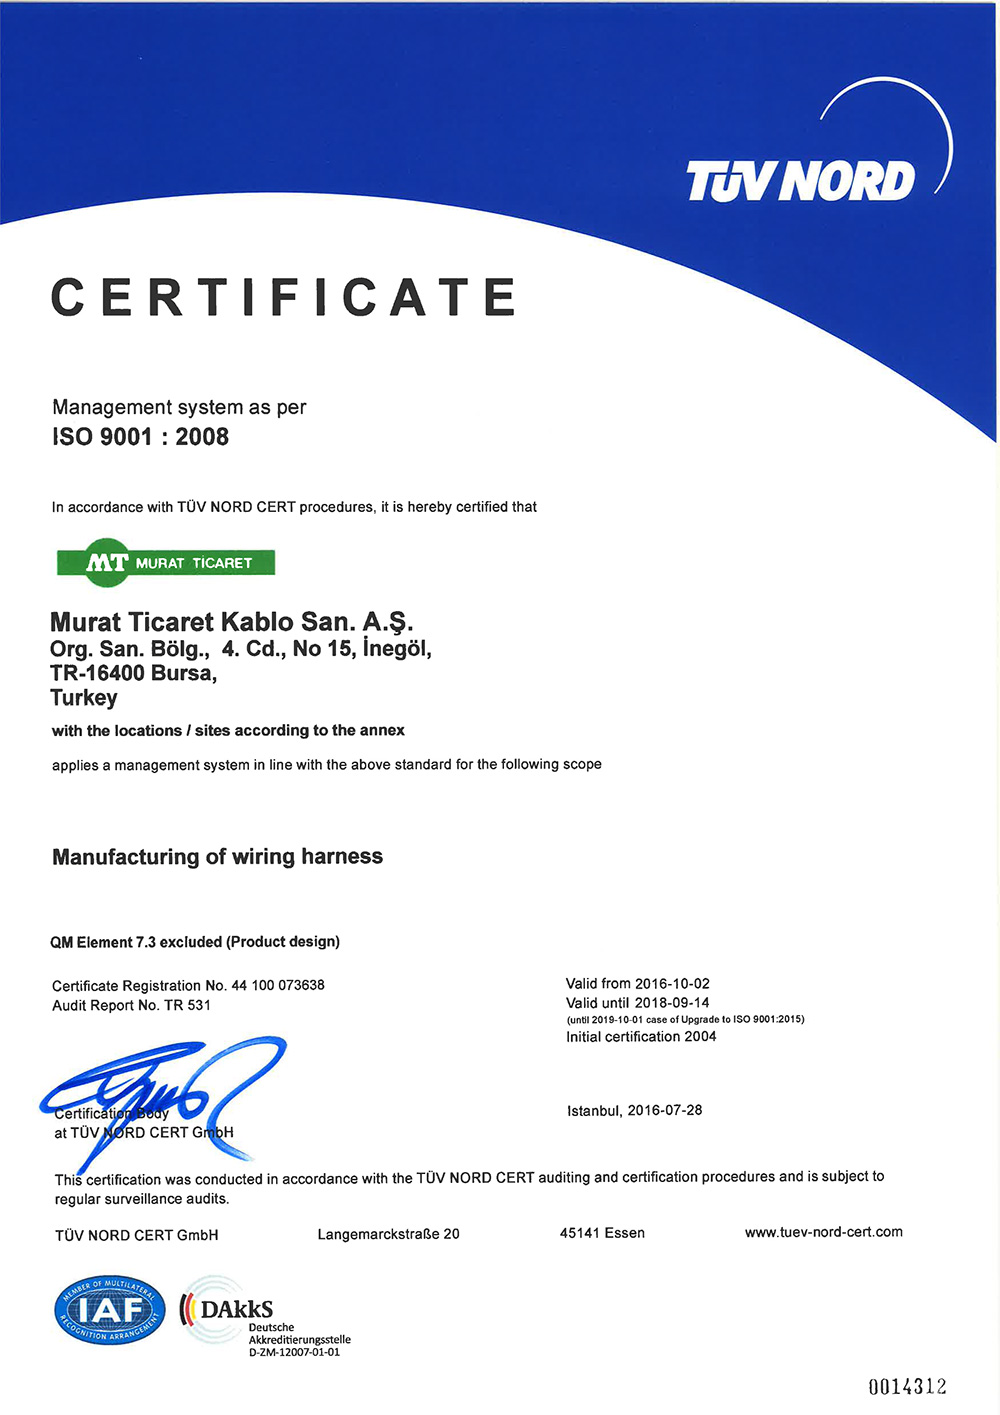 İNEGÖL ISO-9001 CERTIFICATE